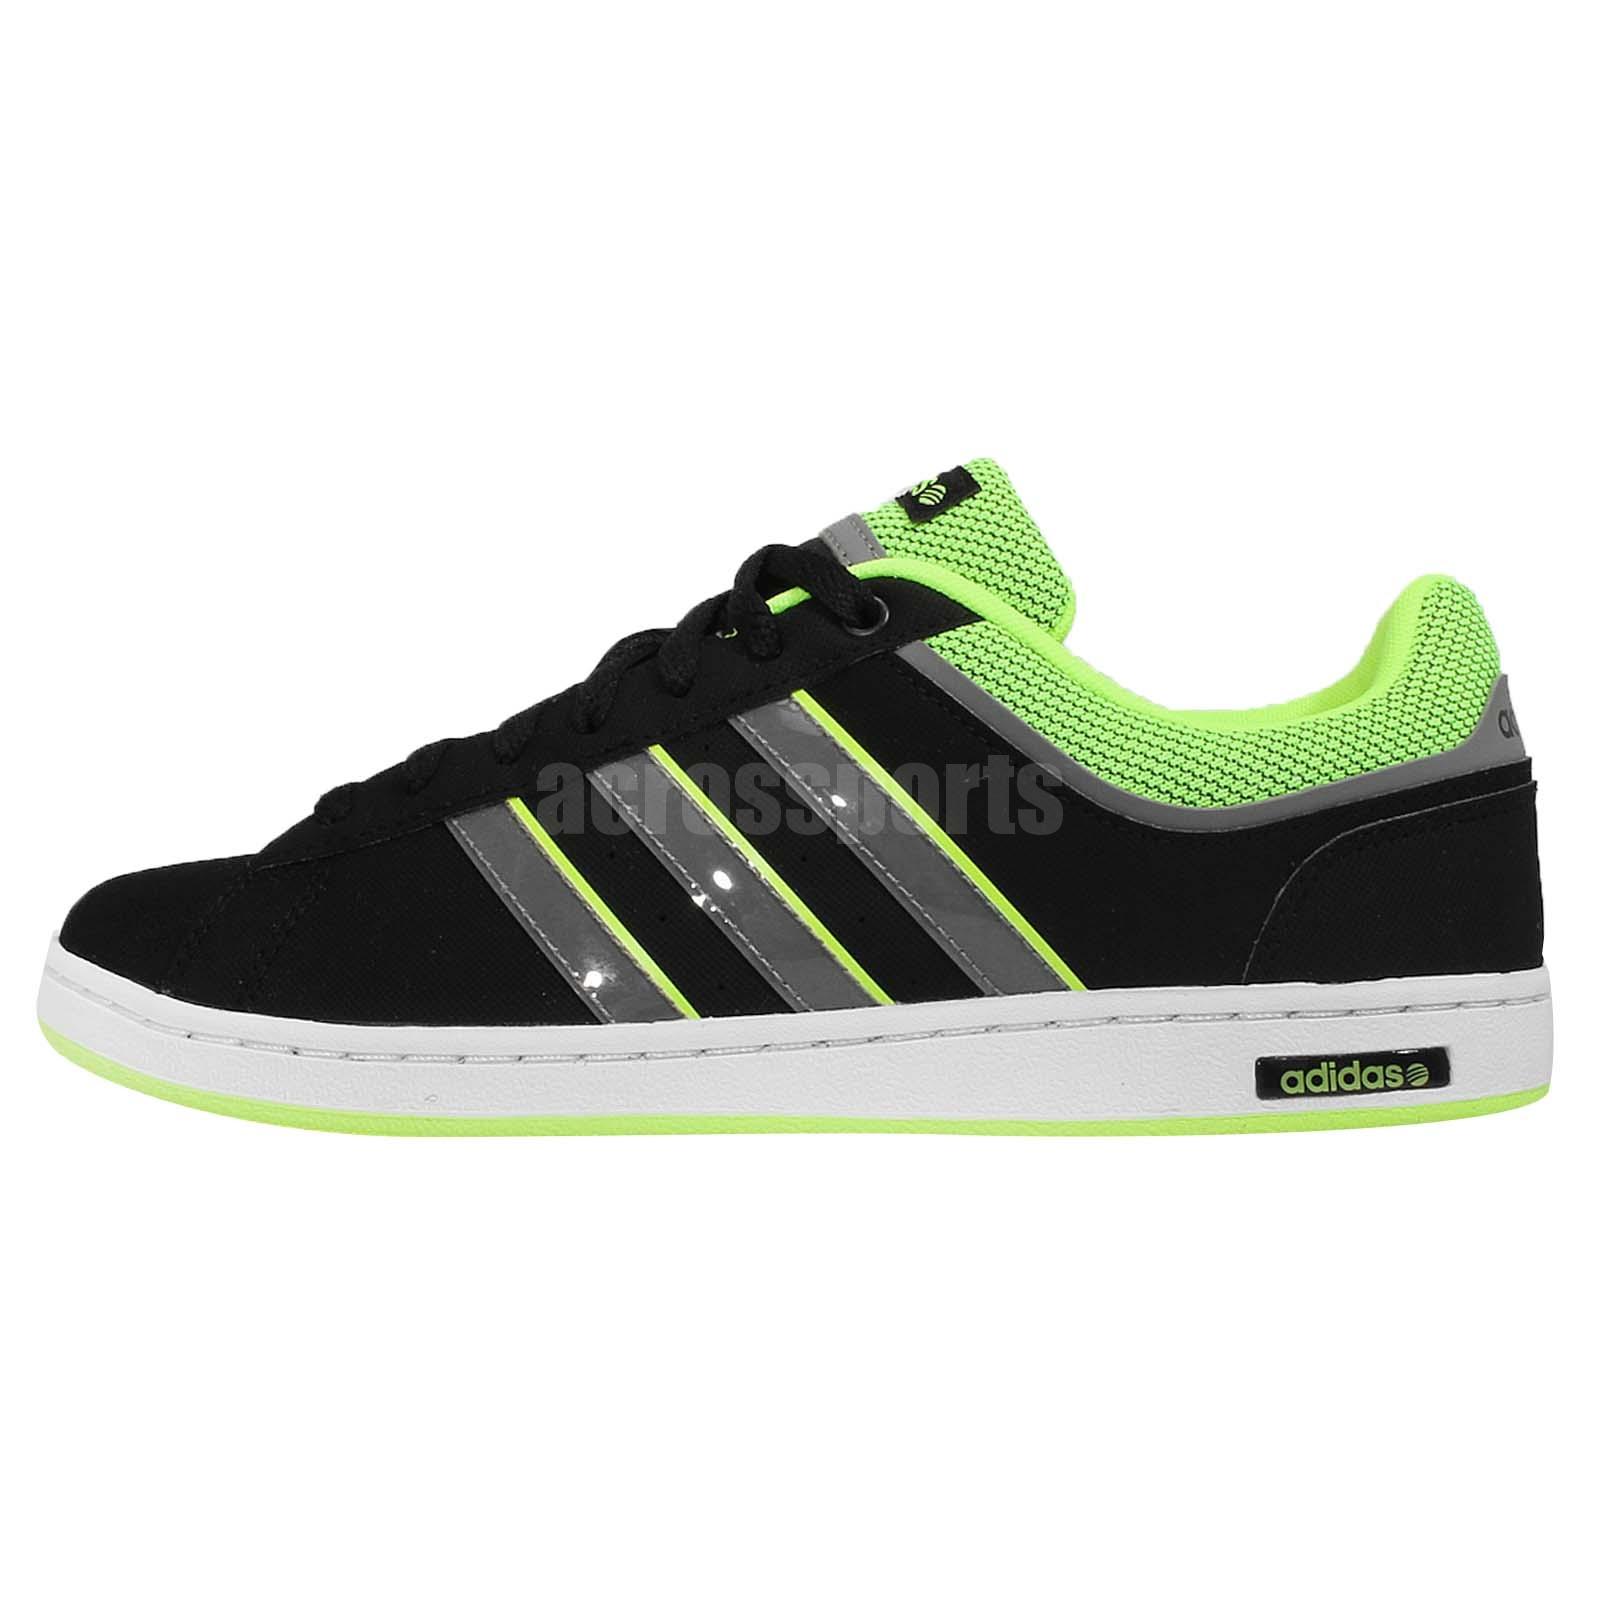 adidas neo label derby set black green mens casual shoes. Black Bedroom Furniture Sets. Home Design Ideas